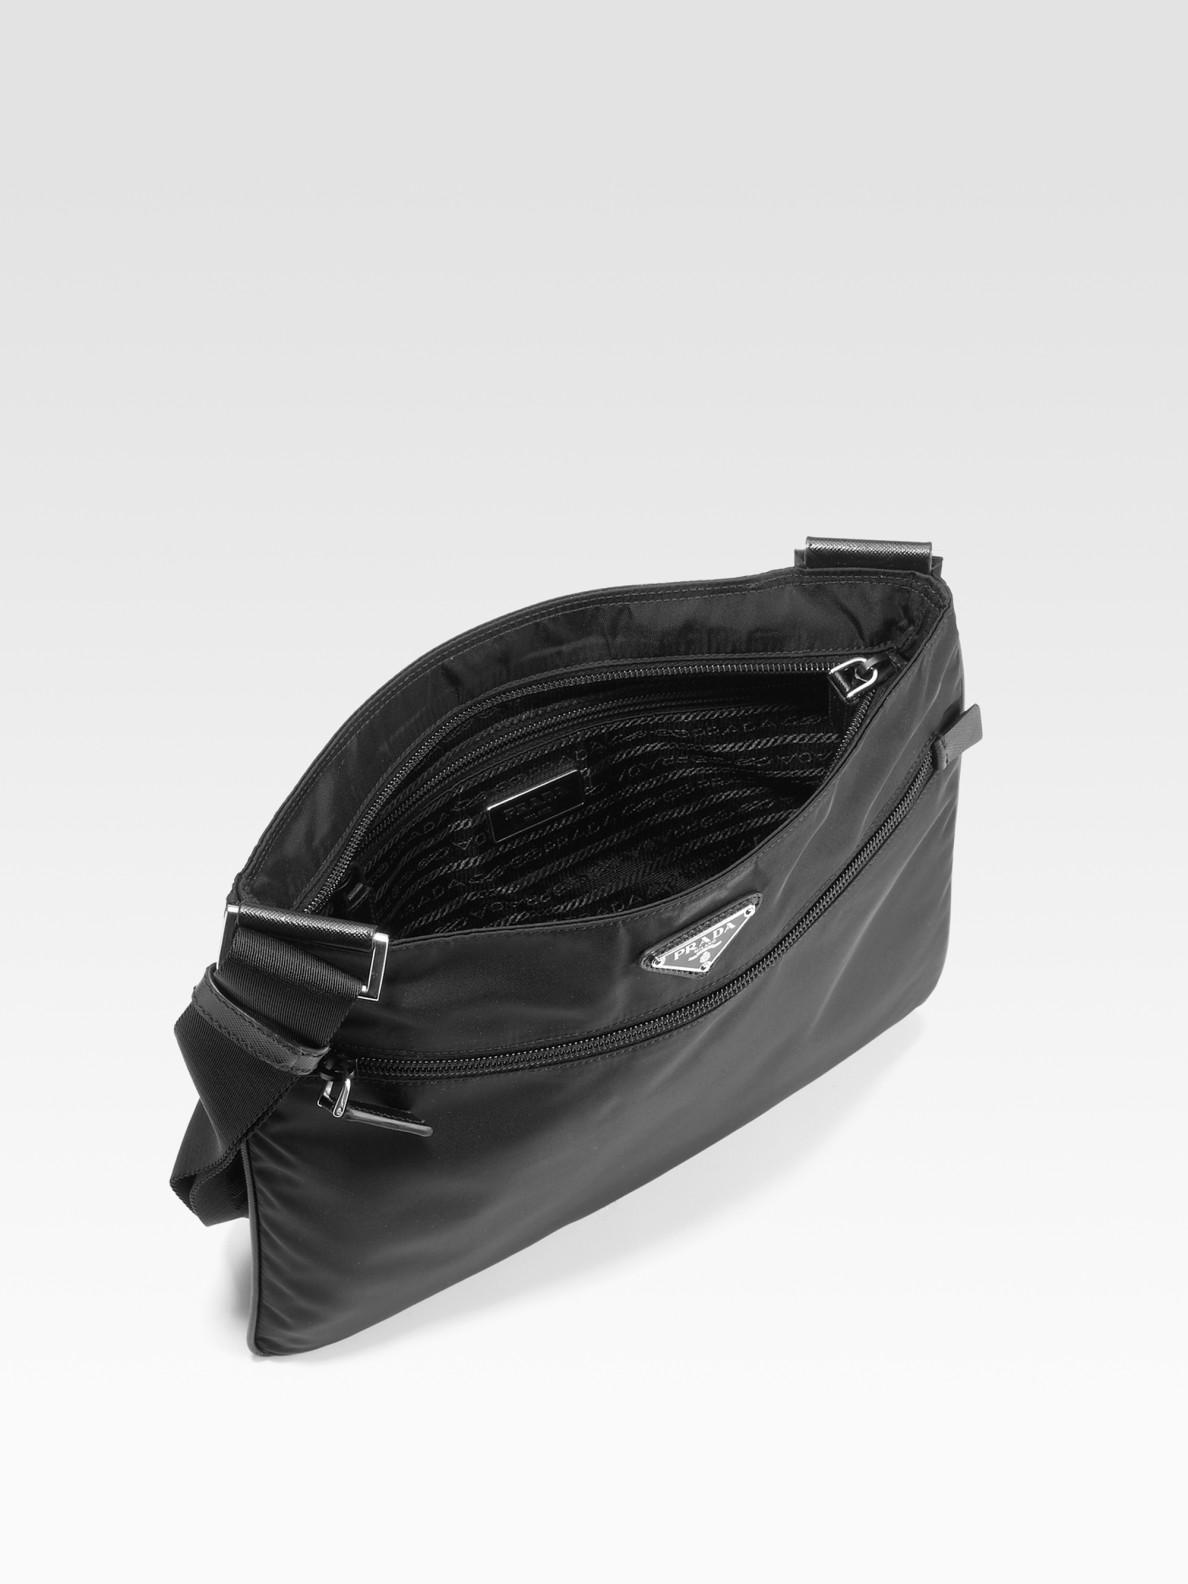 09a7b332ac454b Prada Nylon & Leather Messenger Bag in Black for Men - Lyst